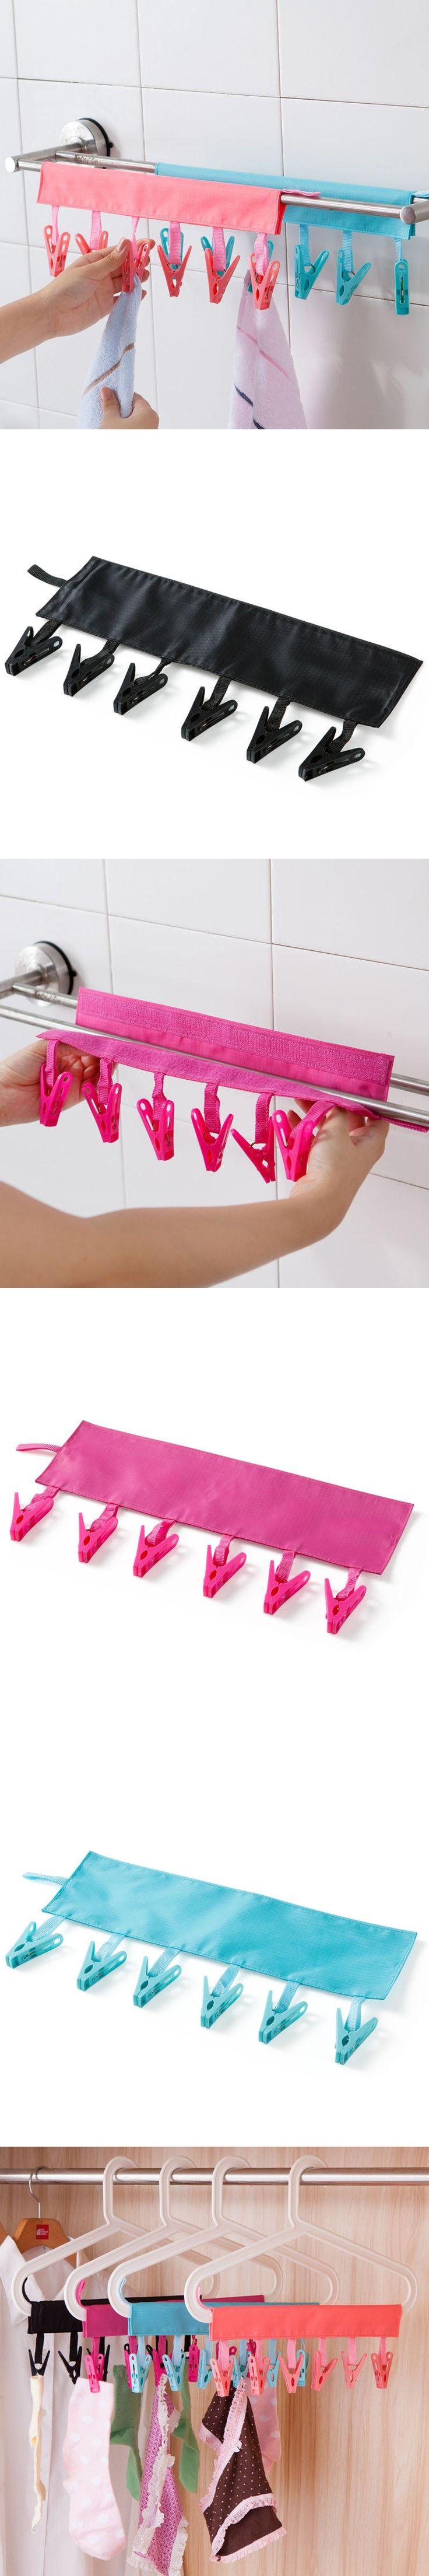 1pc Towel Underwear Socks Foldable Drying Racks Bathroom Rack Clothespin Outdoor Travel Portable Folding Cloth Hanger Clips